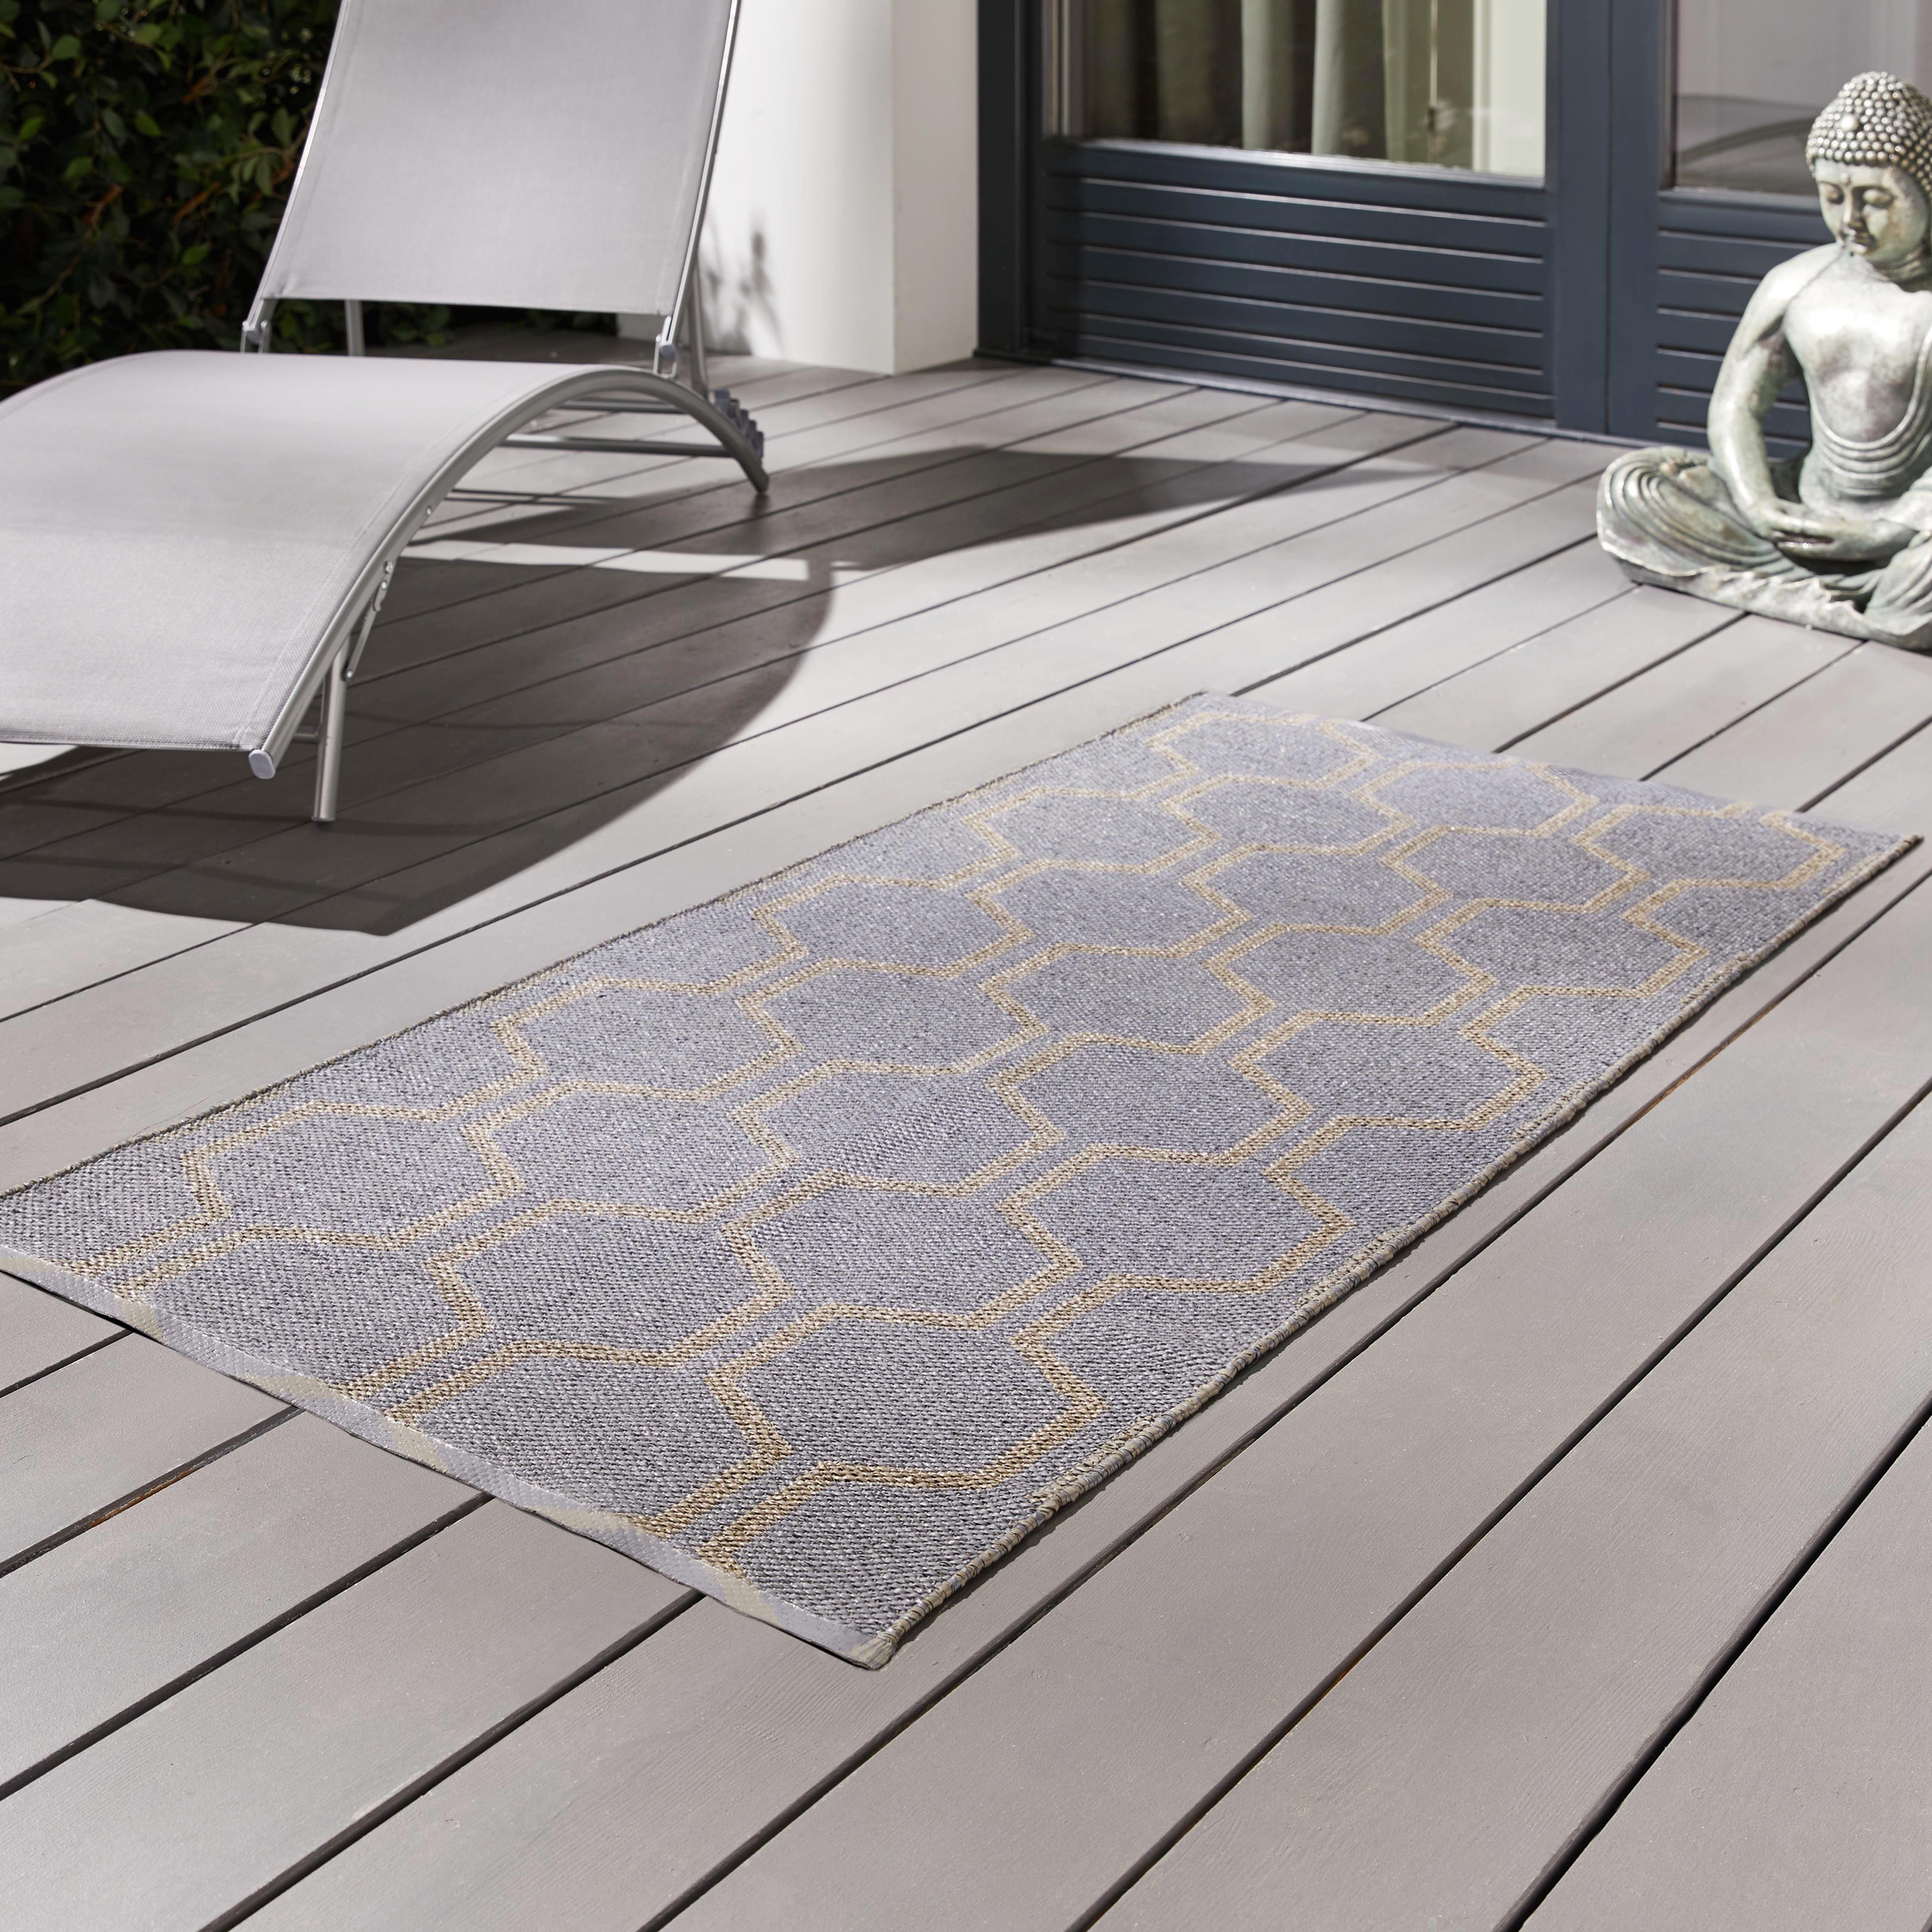 Outdoorteppich Jaques 70x140cm - Taupe/Grau, MODERN, Textil (70/140cm) - MÖMAX modern living